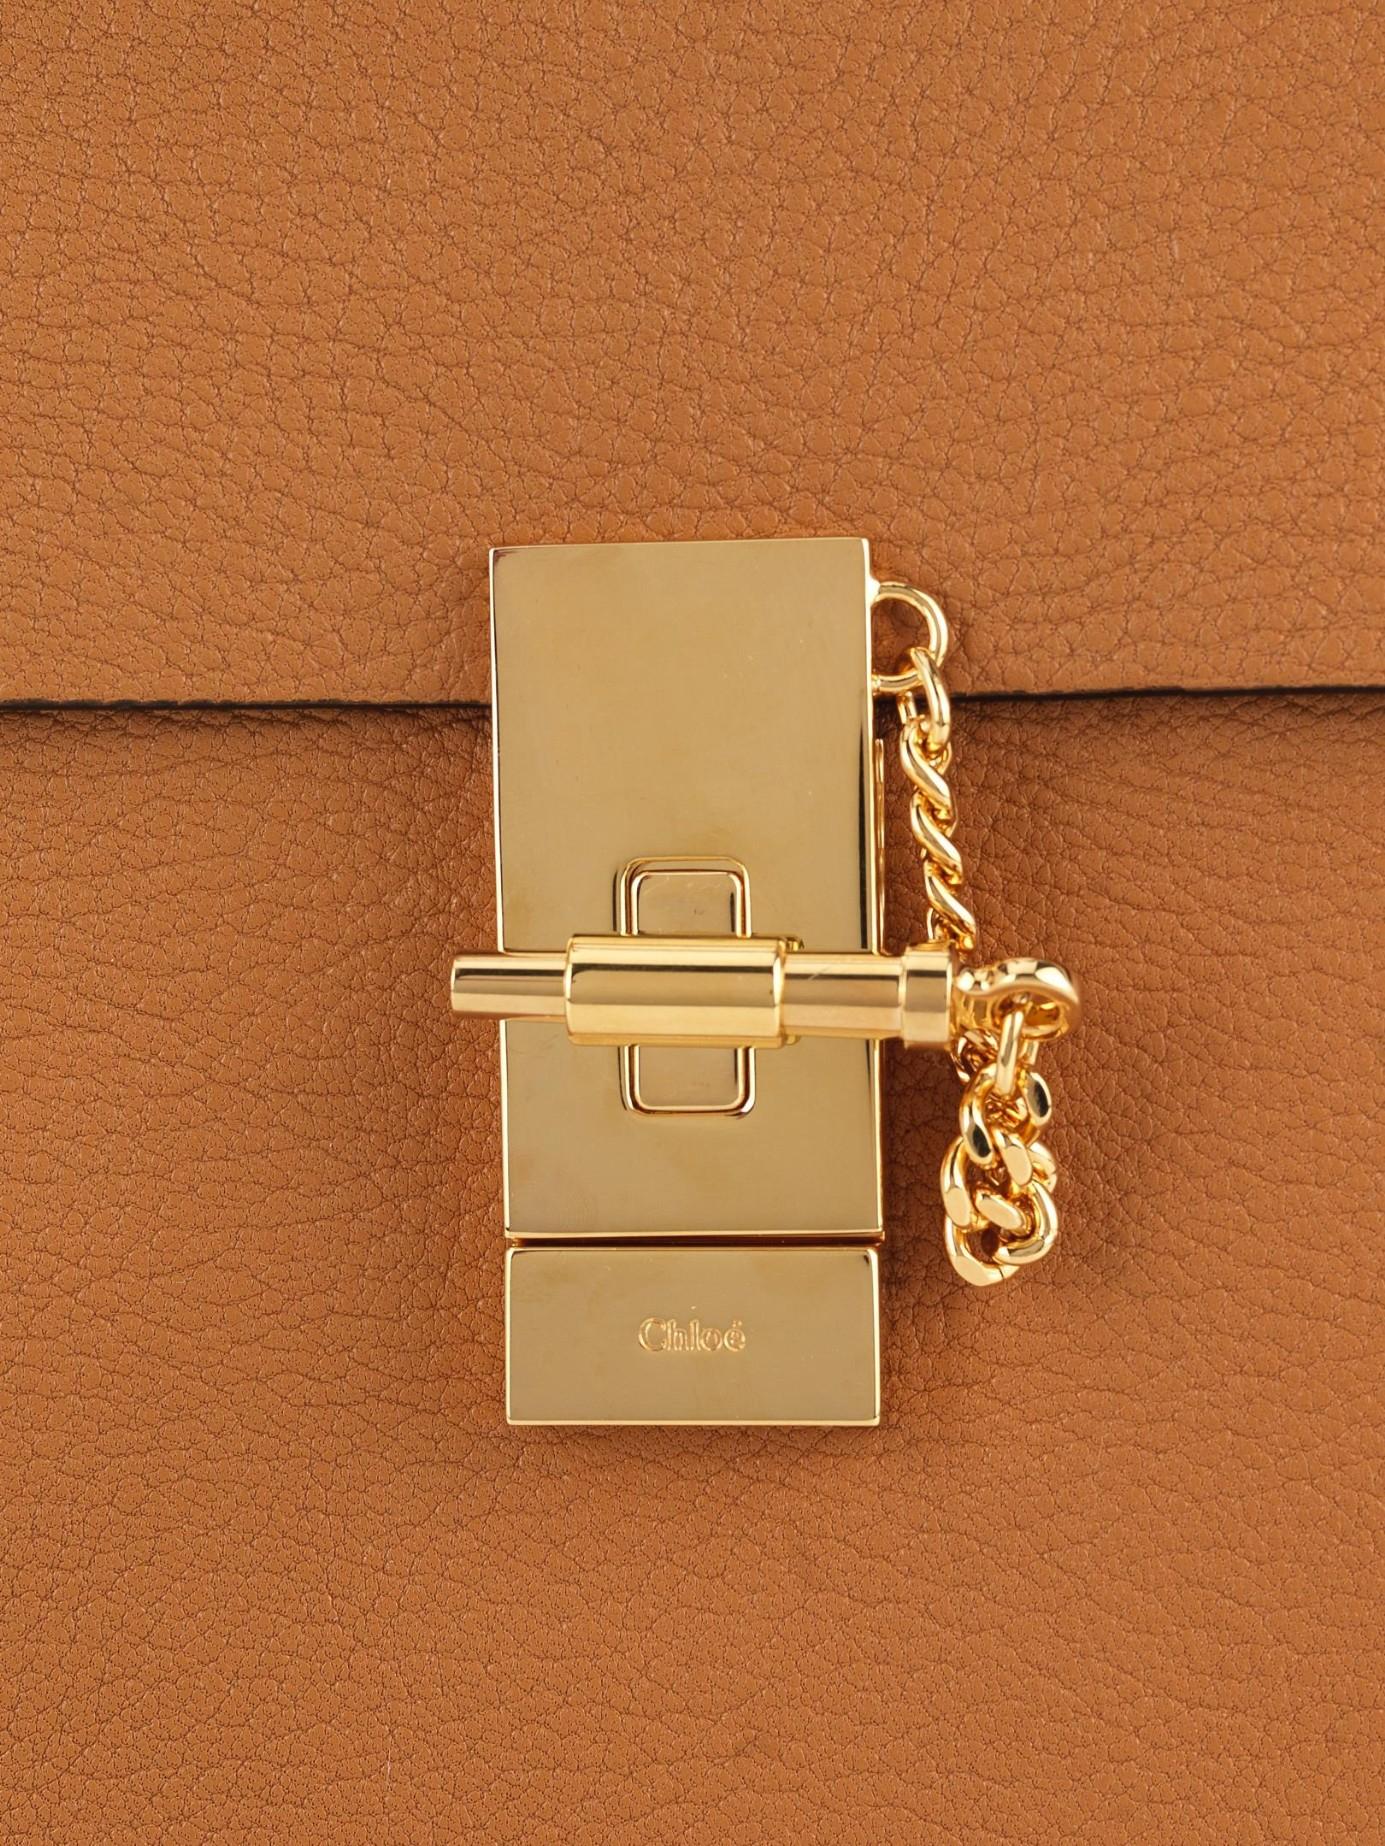 cloe purse - chloe brown leather medium betty bag, chloe marcie replica handbags